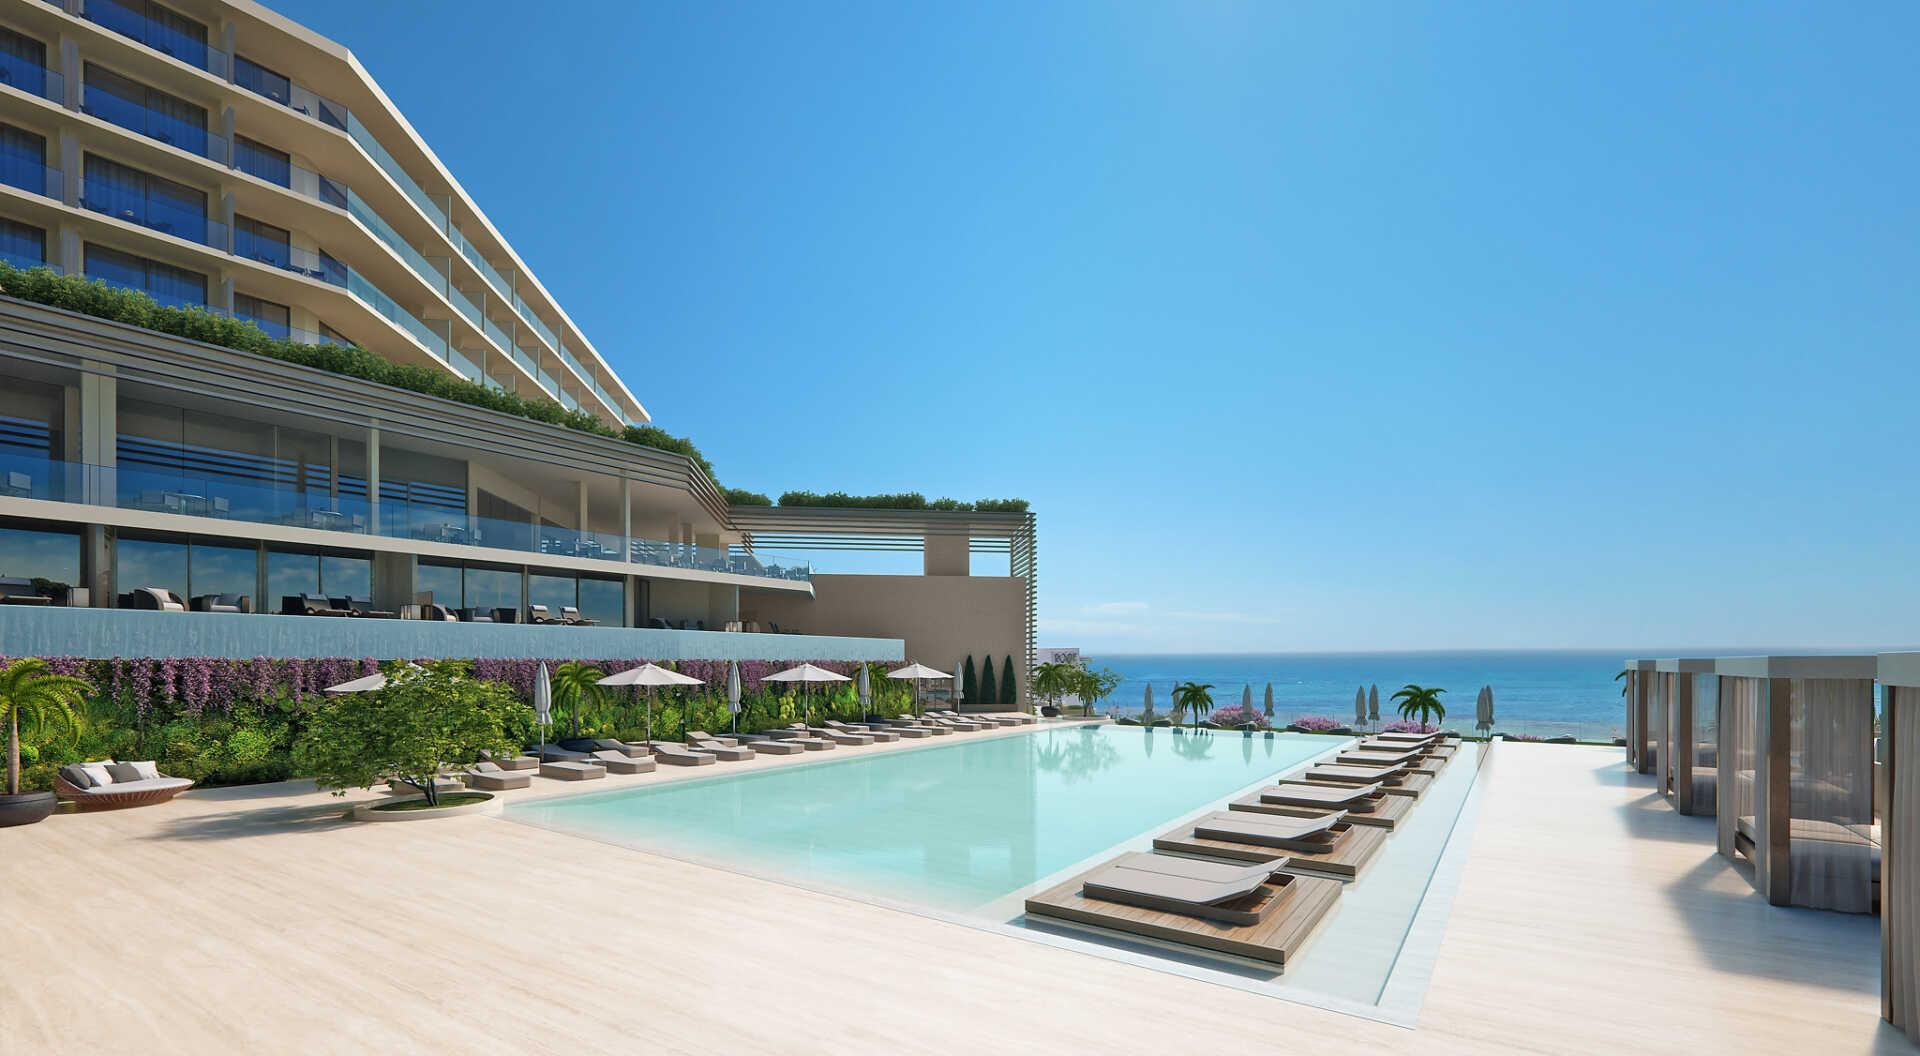 Amarande hotel-Ayia Napa-Jumbo Travel-pool overview